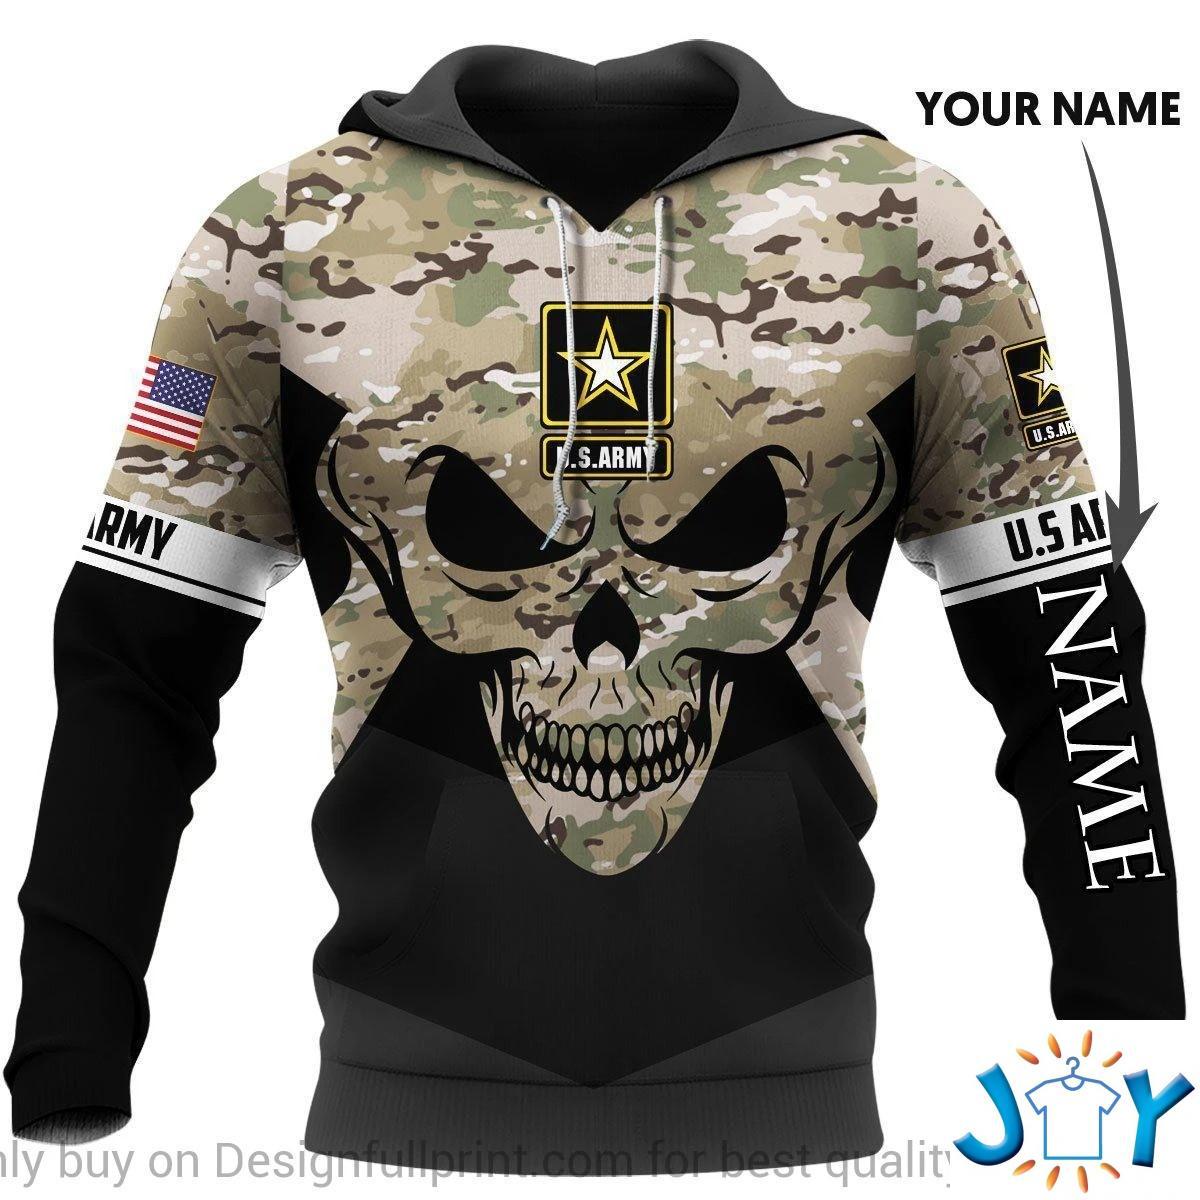 U.S. Army Skull Camo Personalized 3D Hoodie